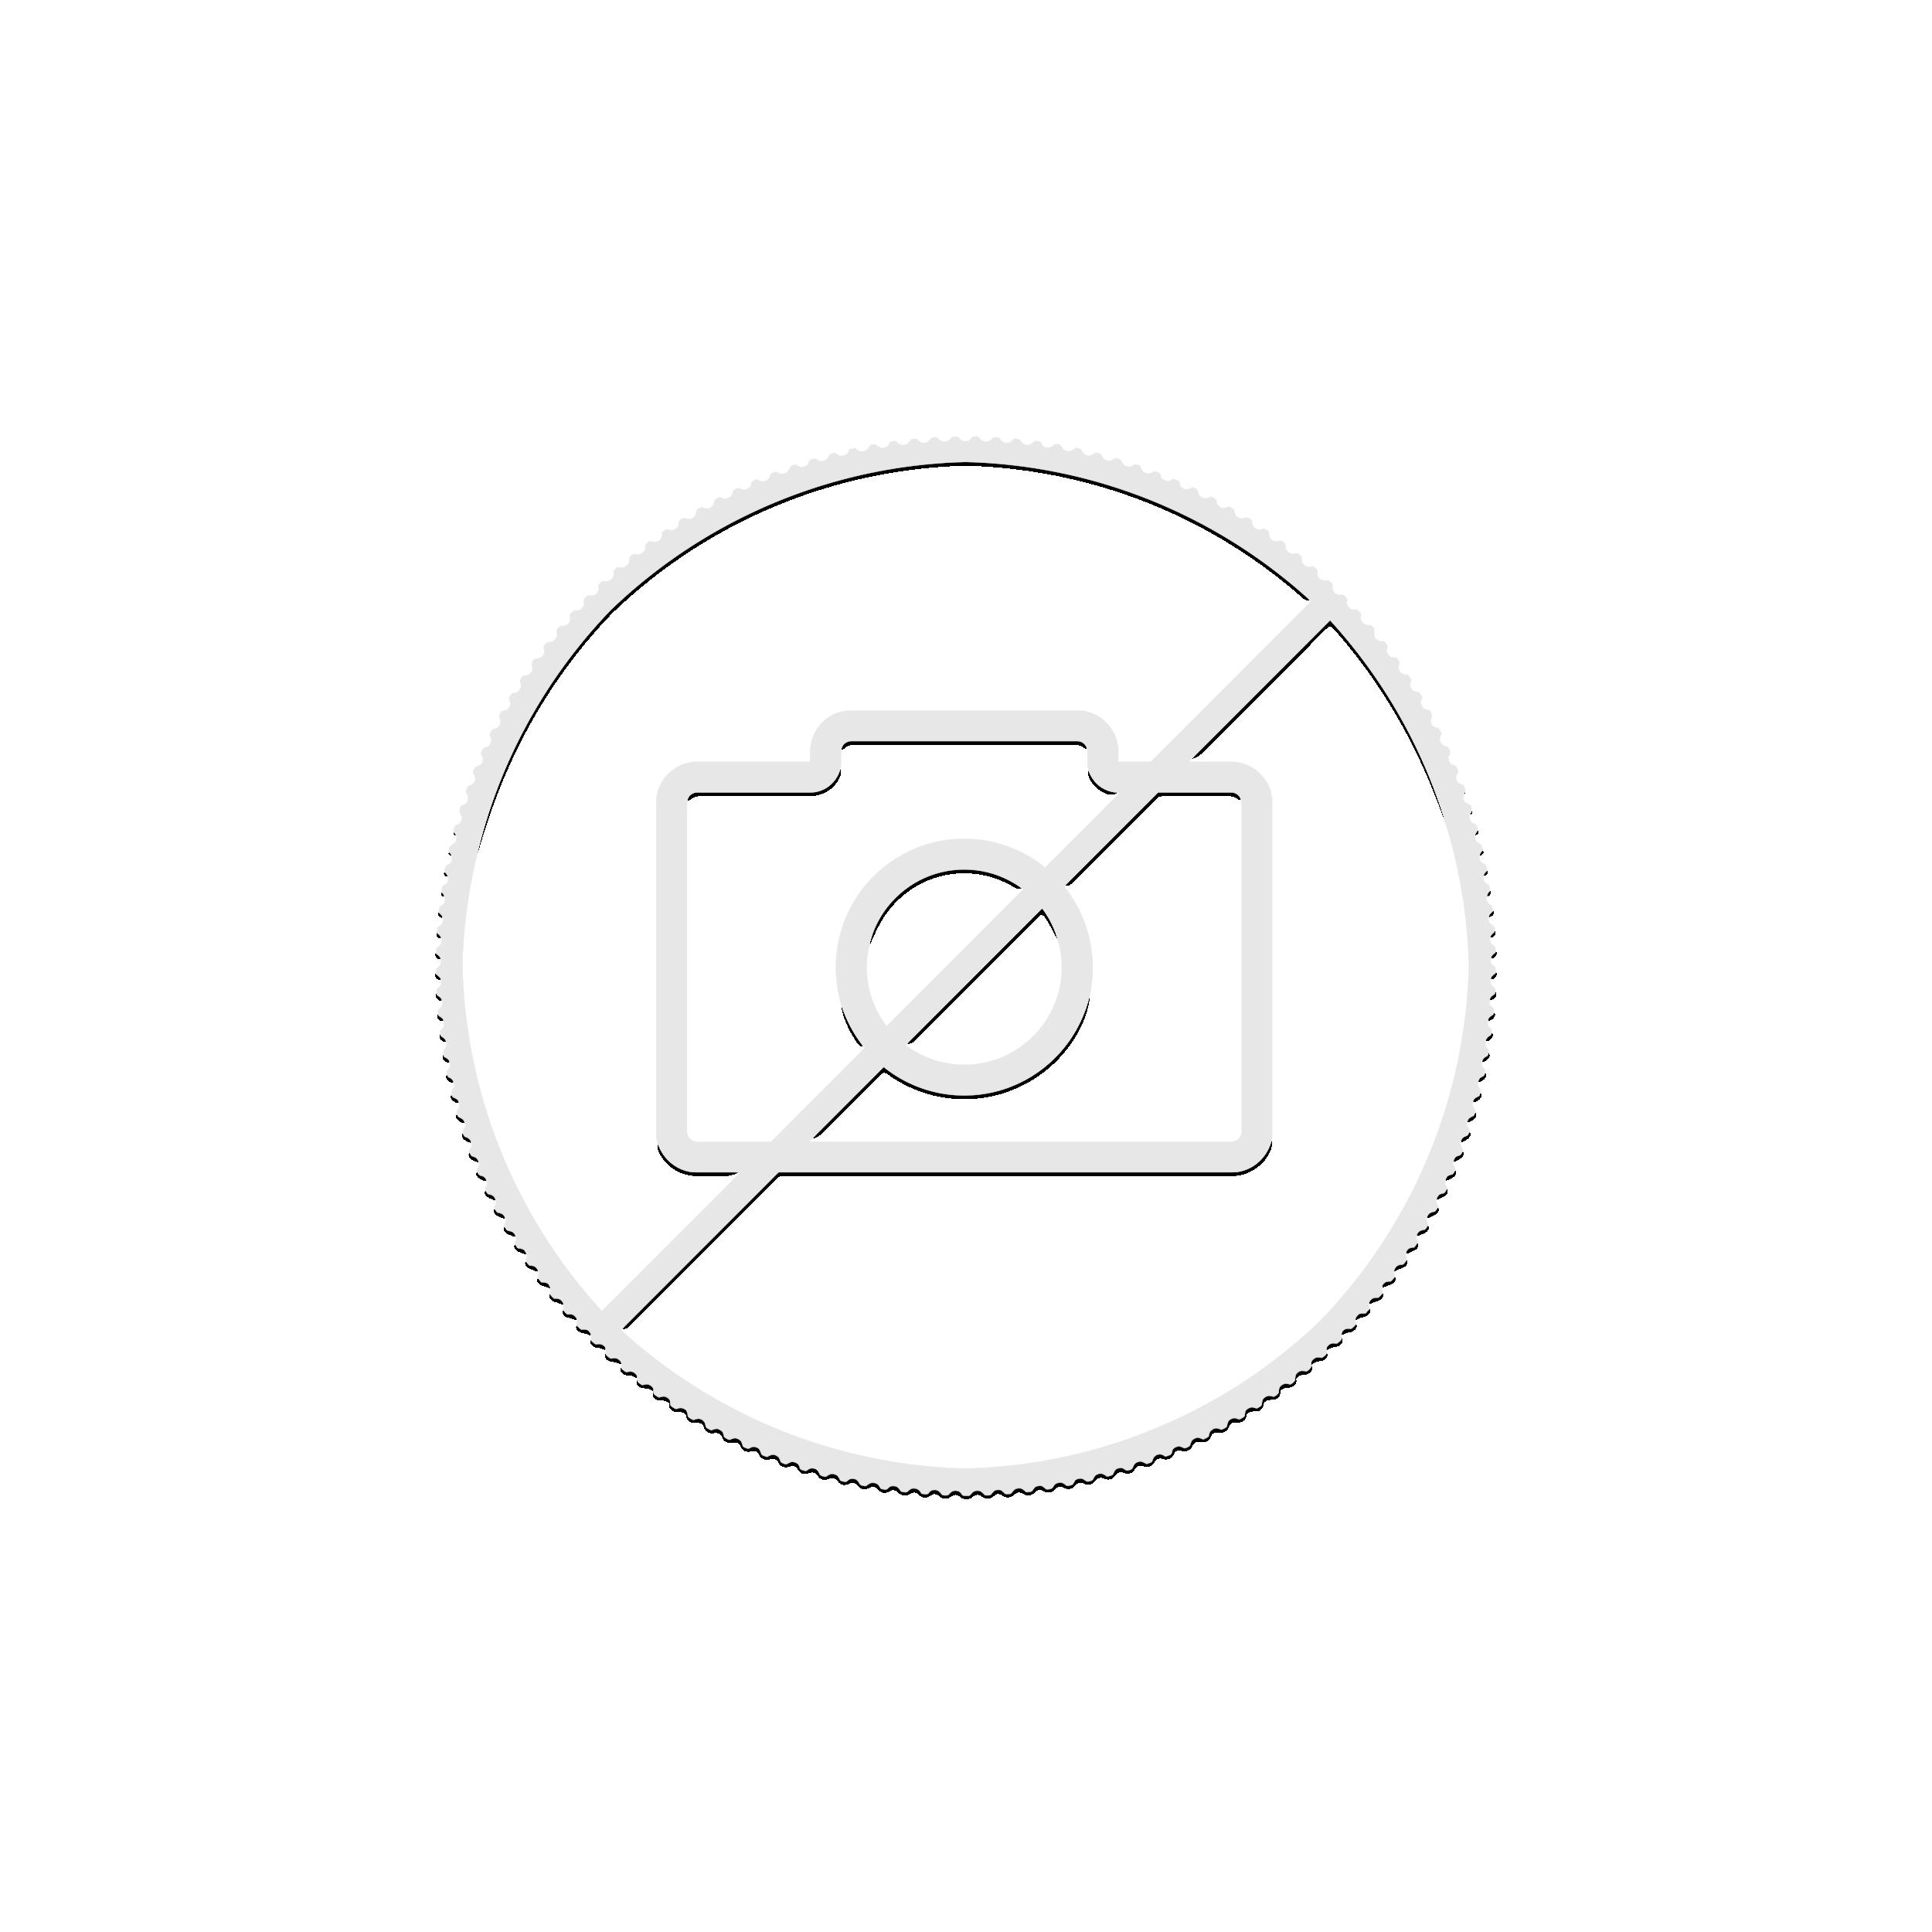 Prestige set gouden Philharmoniker munten